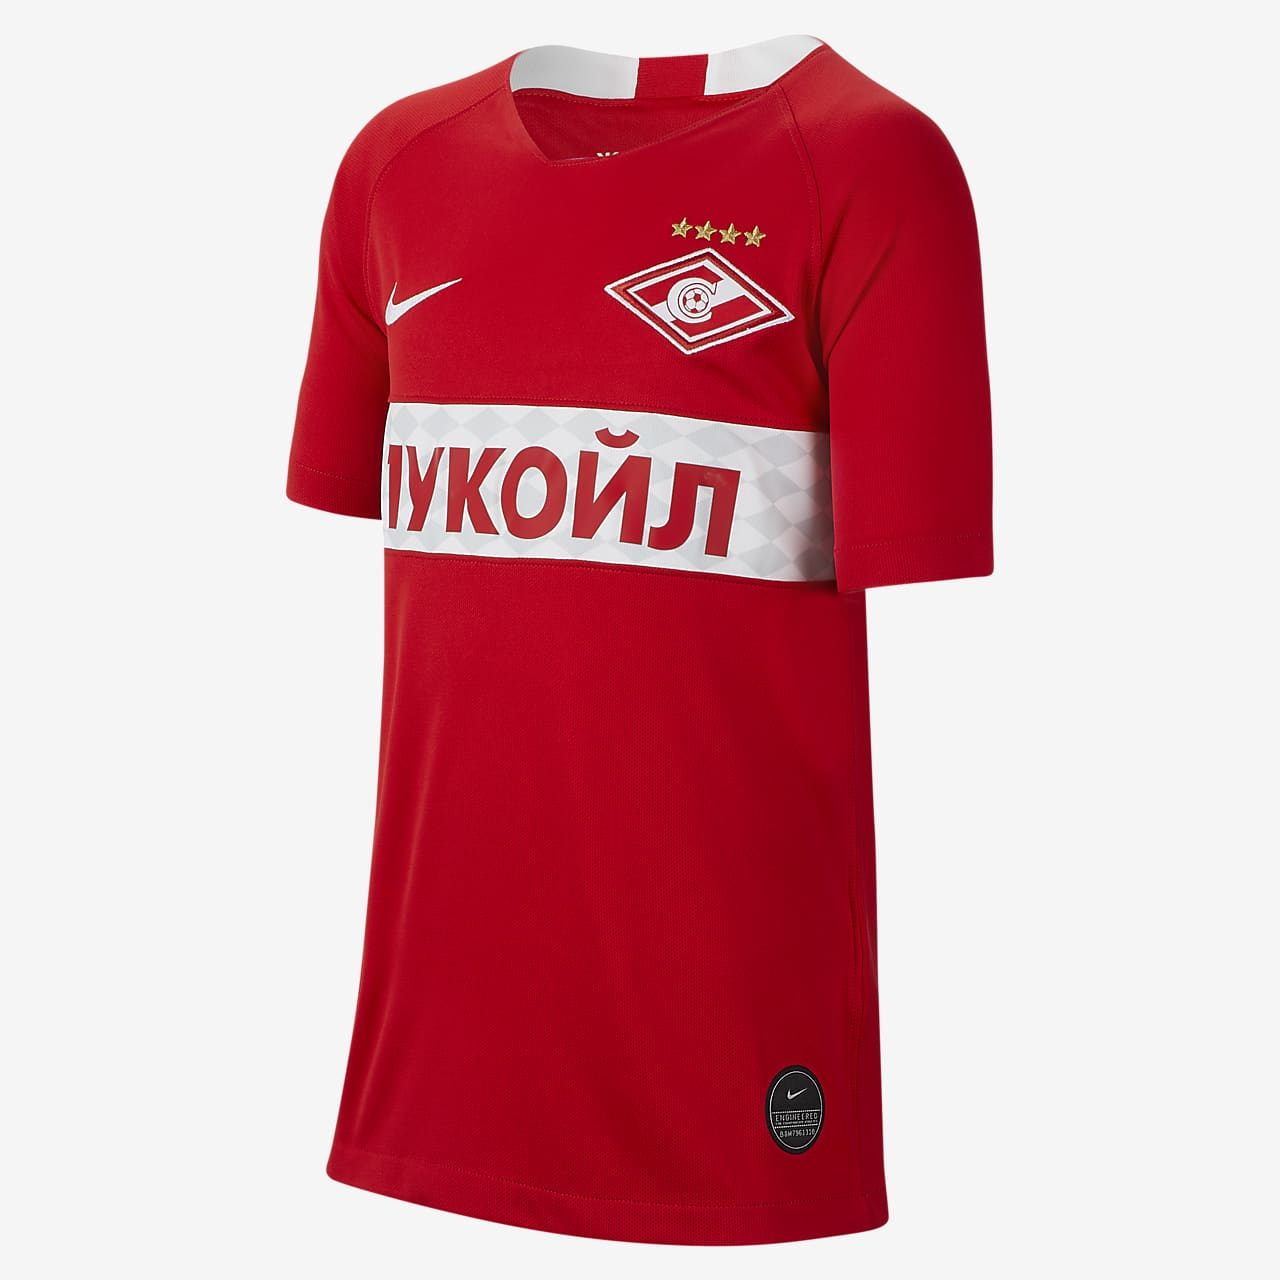 Spartak Moscow 2019/20 Stadium Home Older Kids' Football Shirt